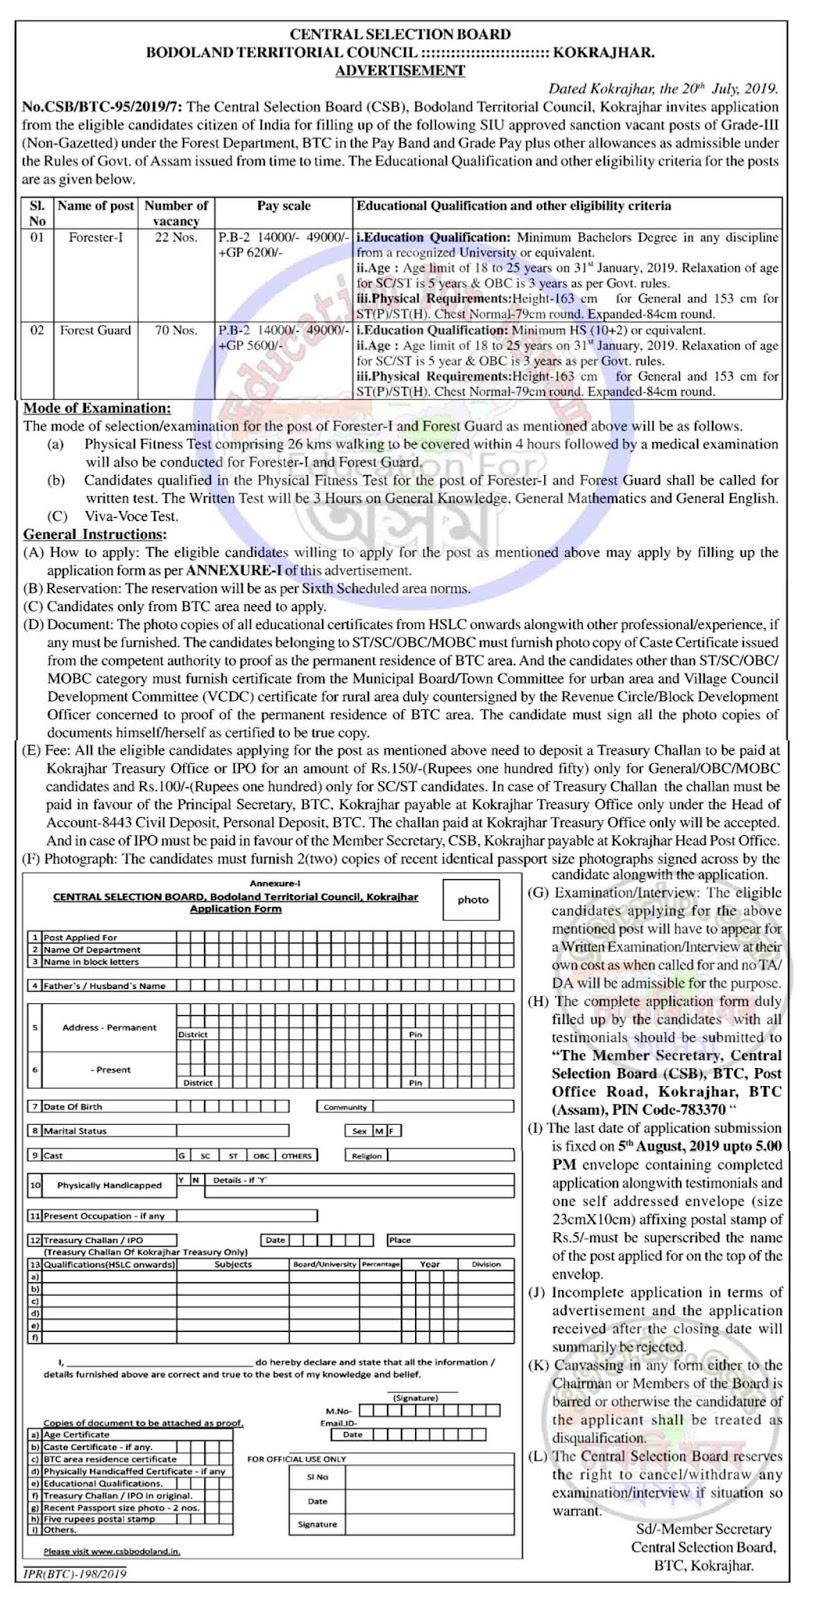 https://www.privatejob4u.com/2019/07/deputycommissionerbiswanath-against.html